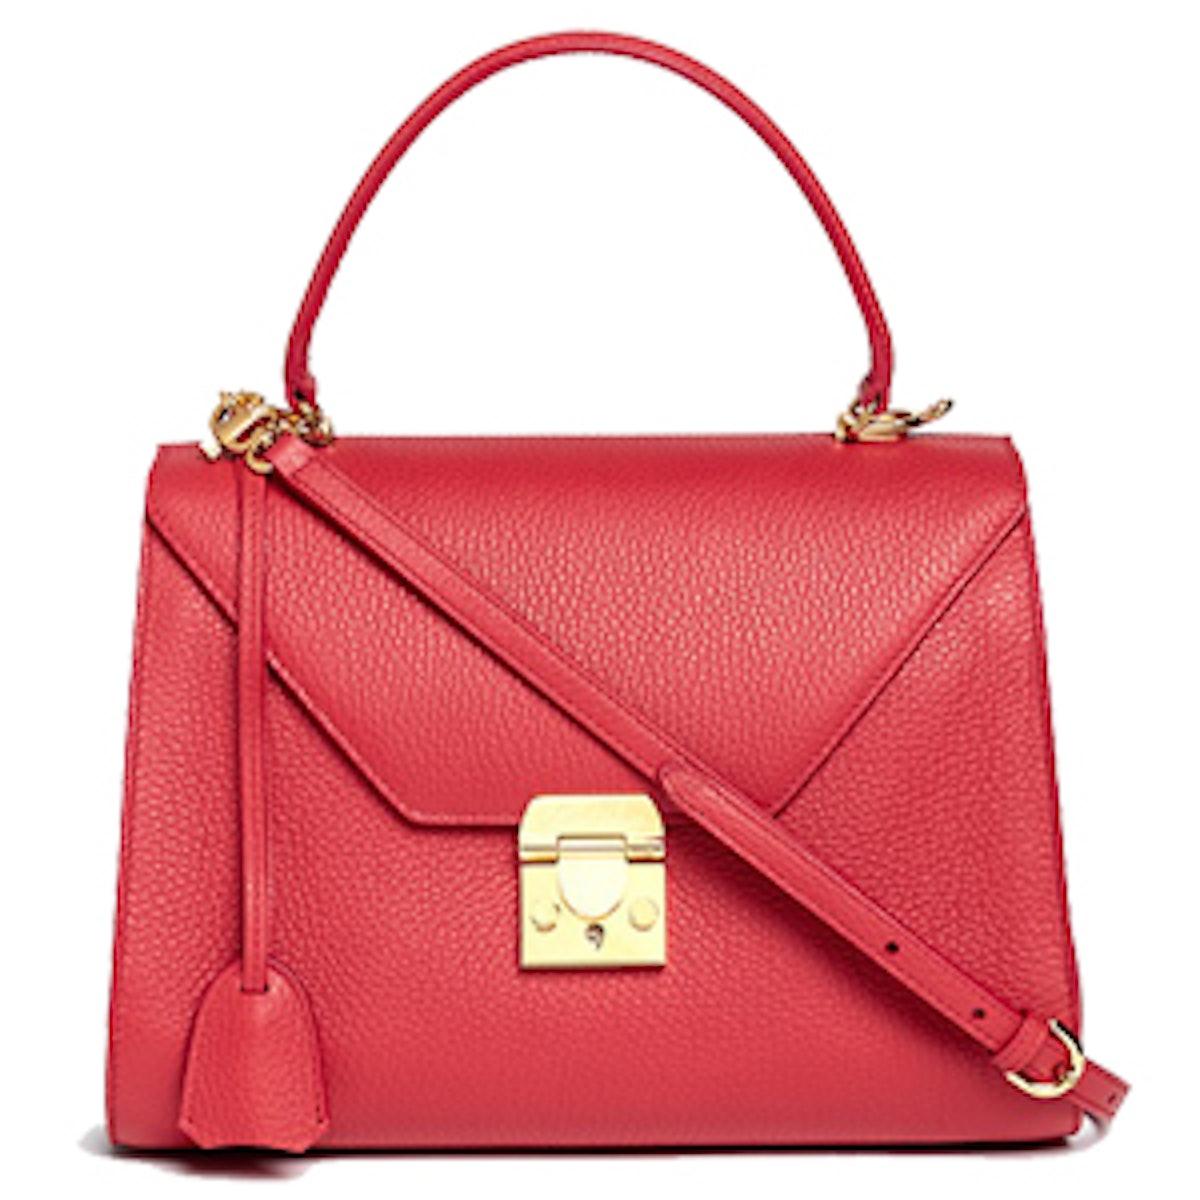 Hadley Small Leather Cross Bag